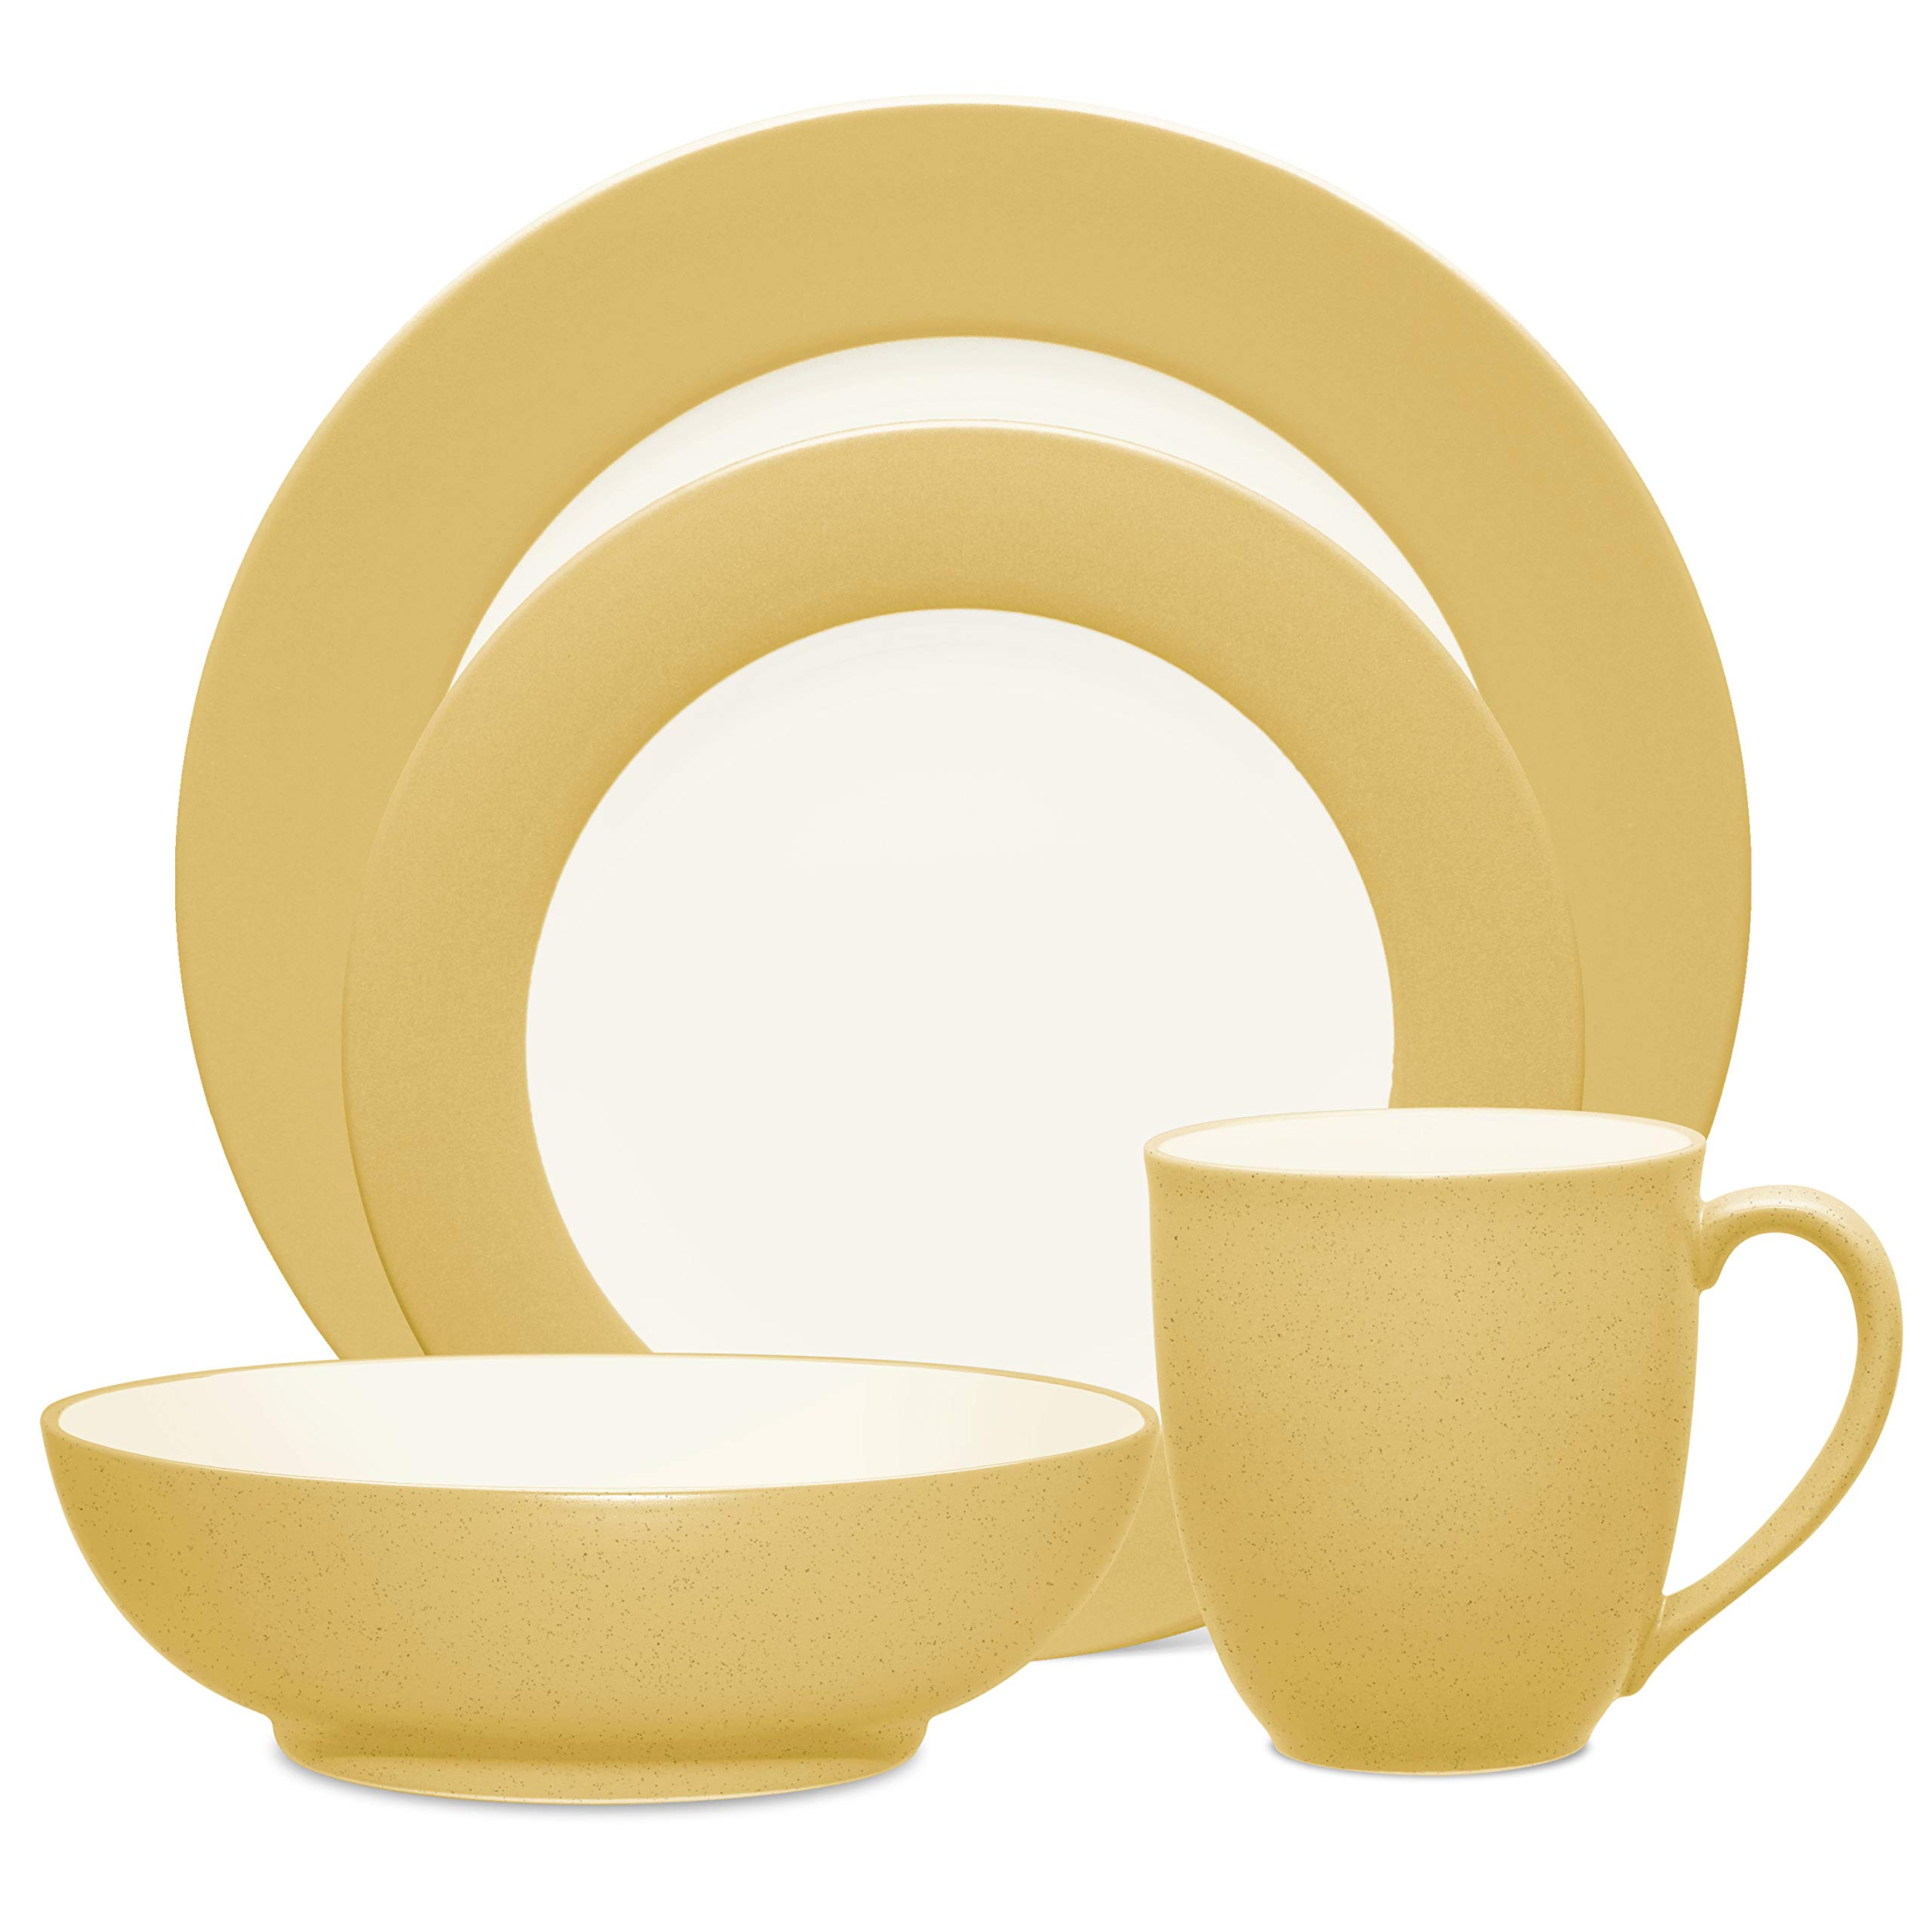 Noritake 4-Piece Colorwave Place Setting, Mustard